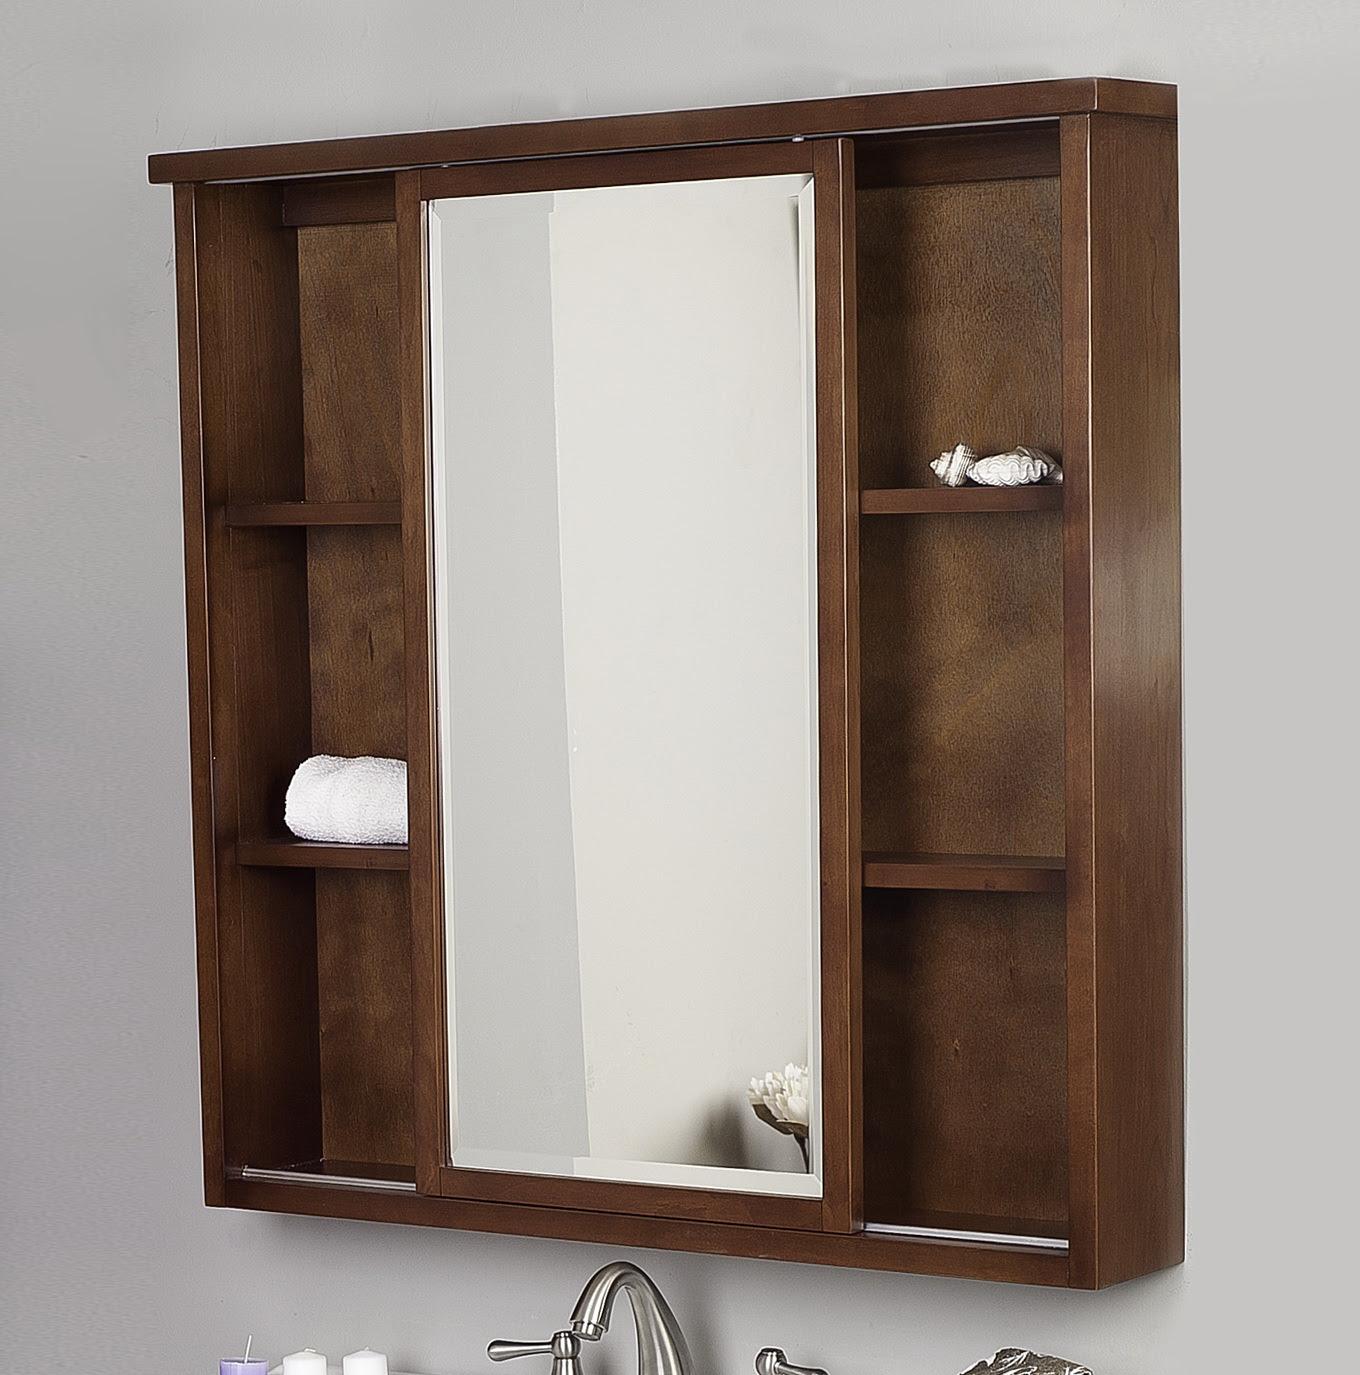 Kohler Mirrored Medicine Cabinet Lowe U002639 S Canada Living Room Decoration Ideas